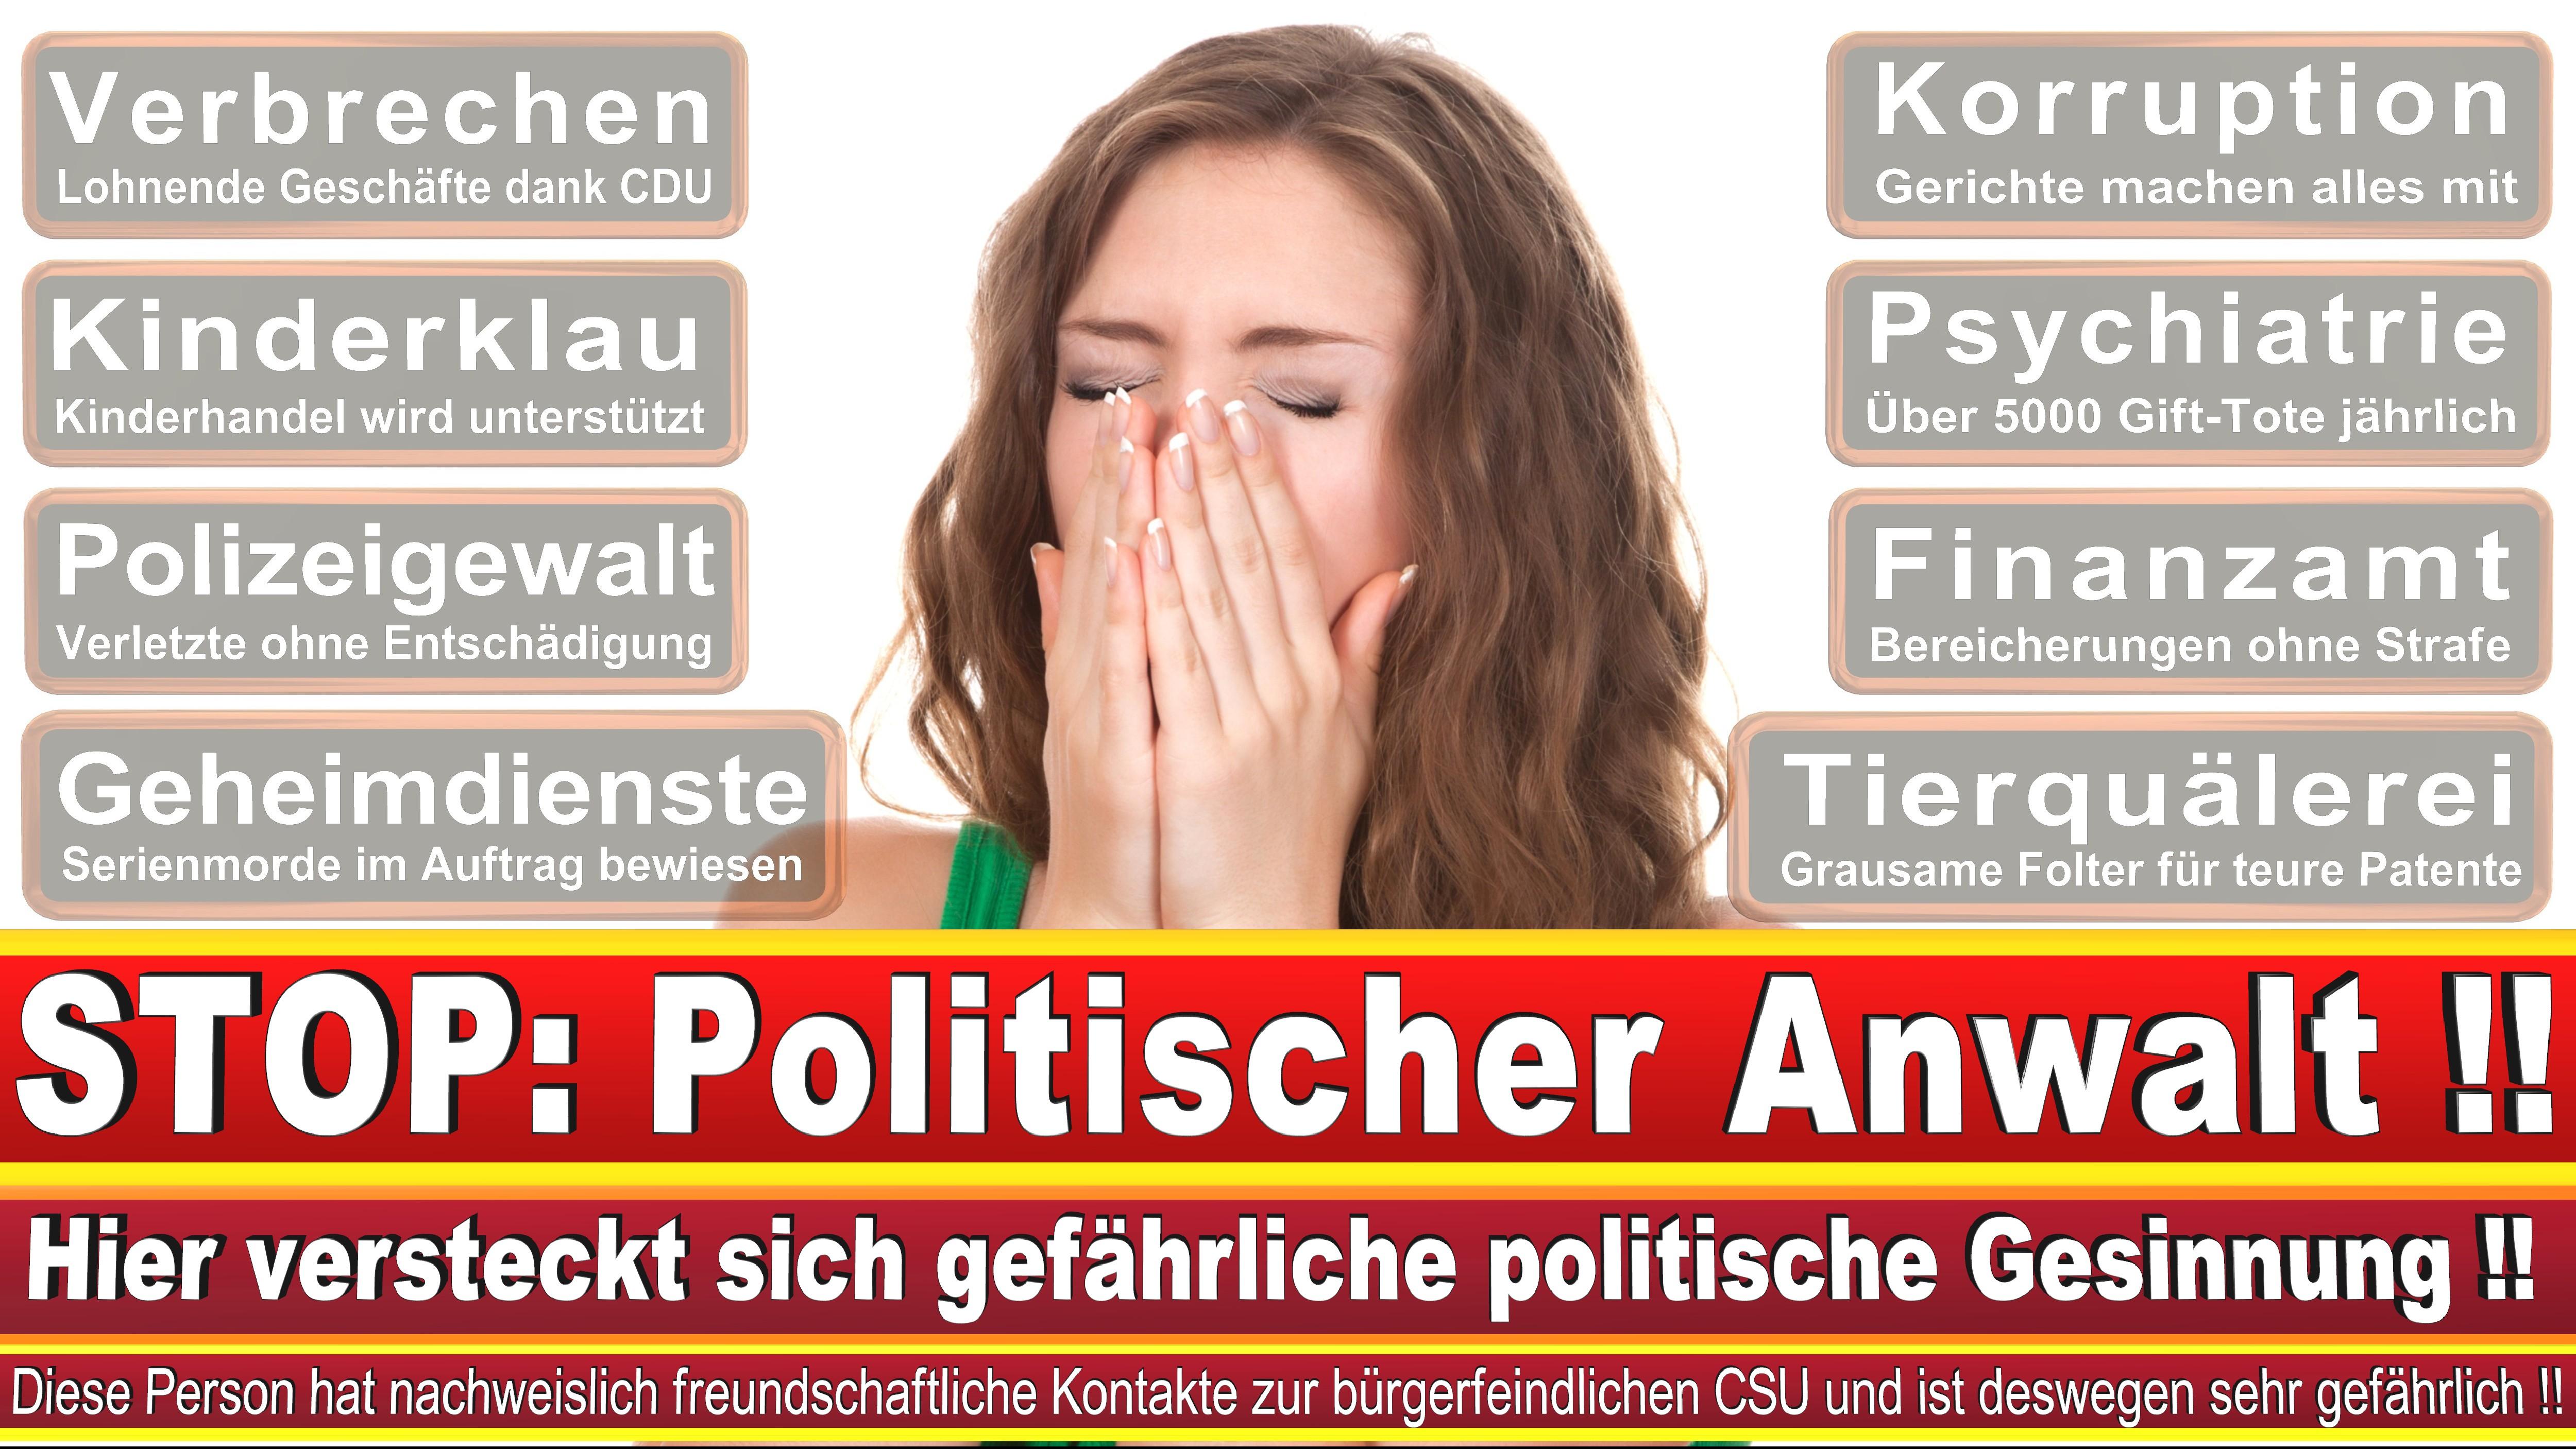 Rechtsanwältin Caroline Brandt Bad Doberan Selbstständig Rechtsanwältin Rechtsanwaltskanzlei Brandt